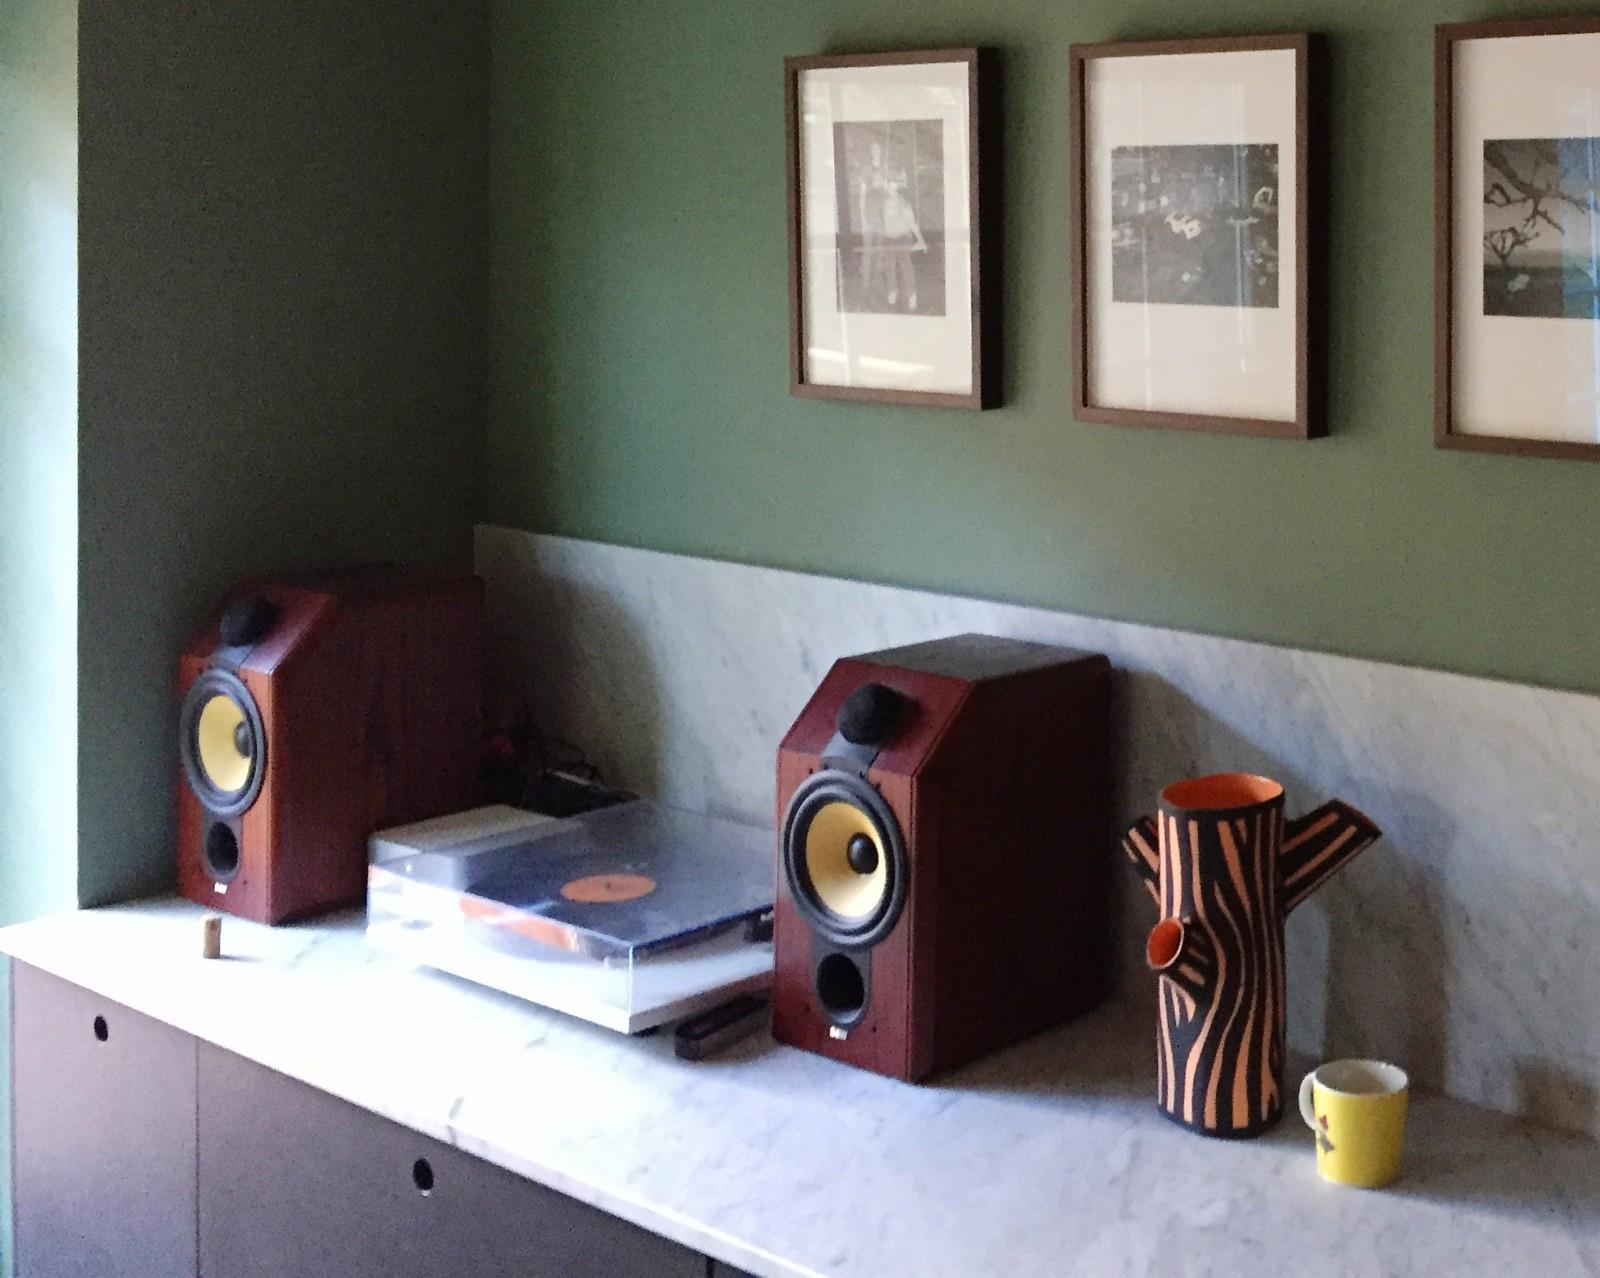 Sonos Connect Amp med B&W CDM 1 - Oslo  - Sonos Connect Amp selges med et par nydelige klassikere fra B&W. Se anmeldelse av høyttalerne her https://www.stereophile.com/standloudspeakers/630/index.html - Oslo